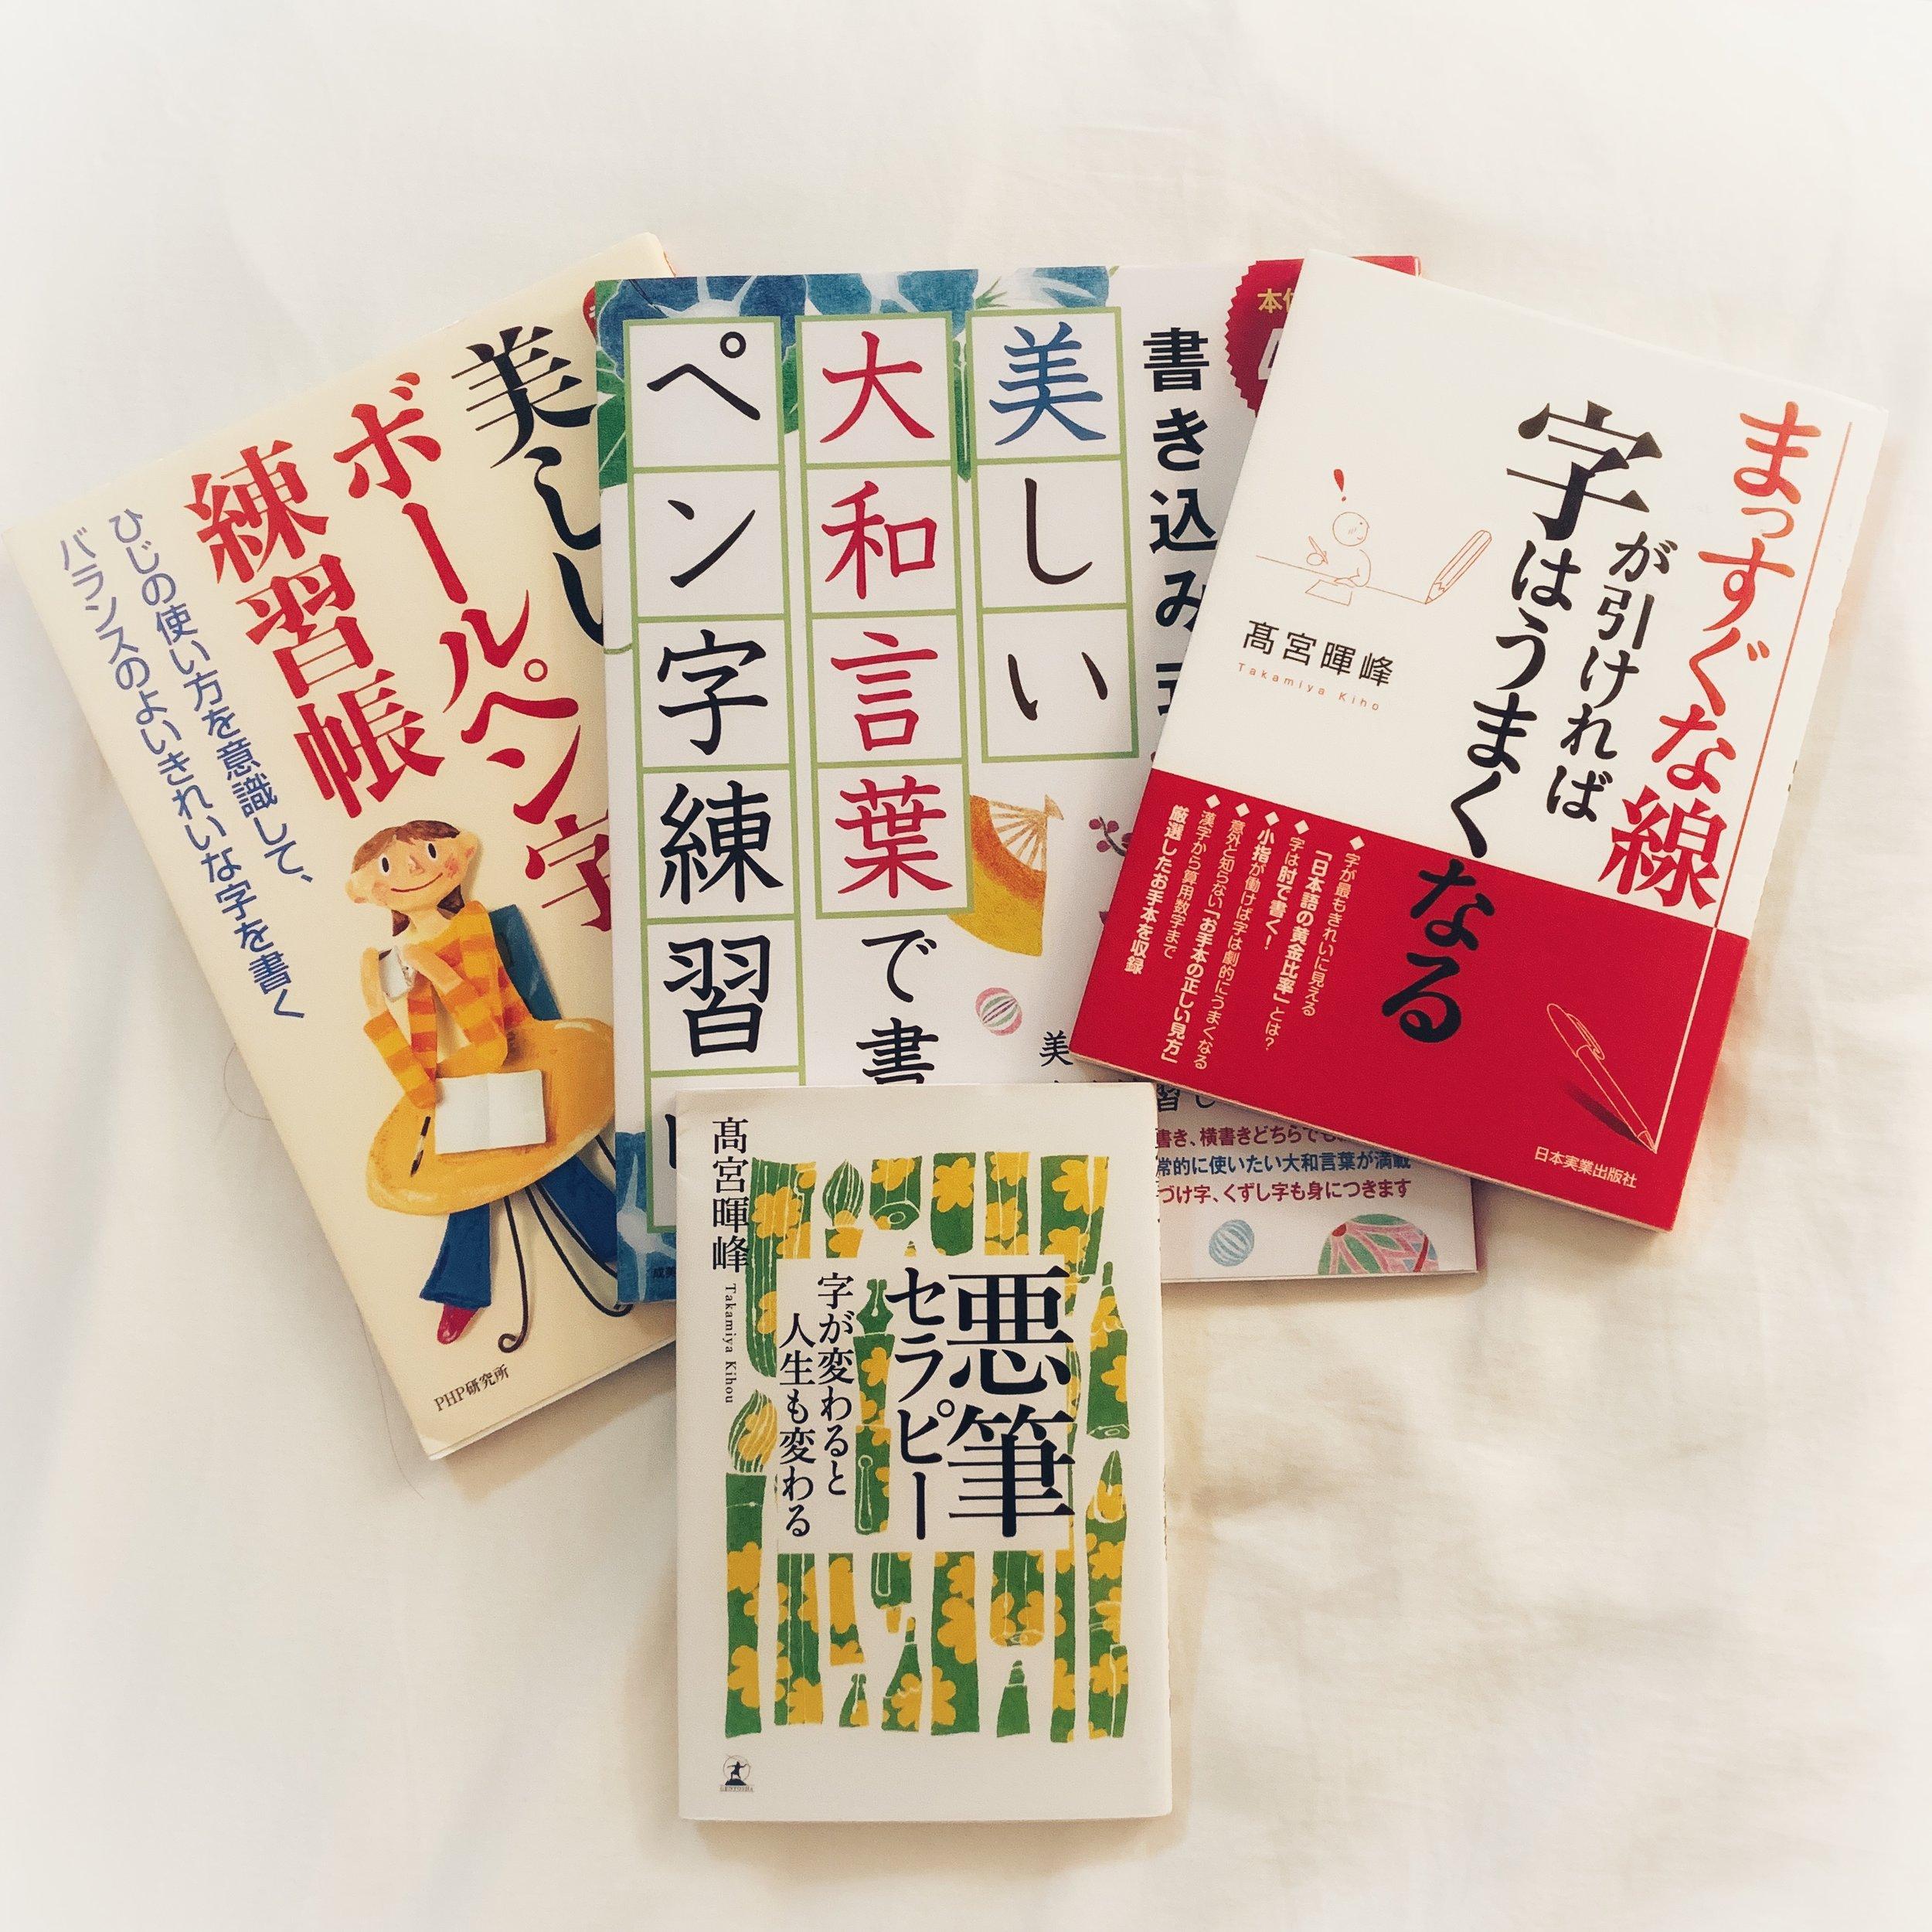 Books I own written by Hanako Sensei. All first edition. 手元の華子先生のご著書。全て初版。